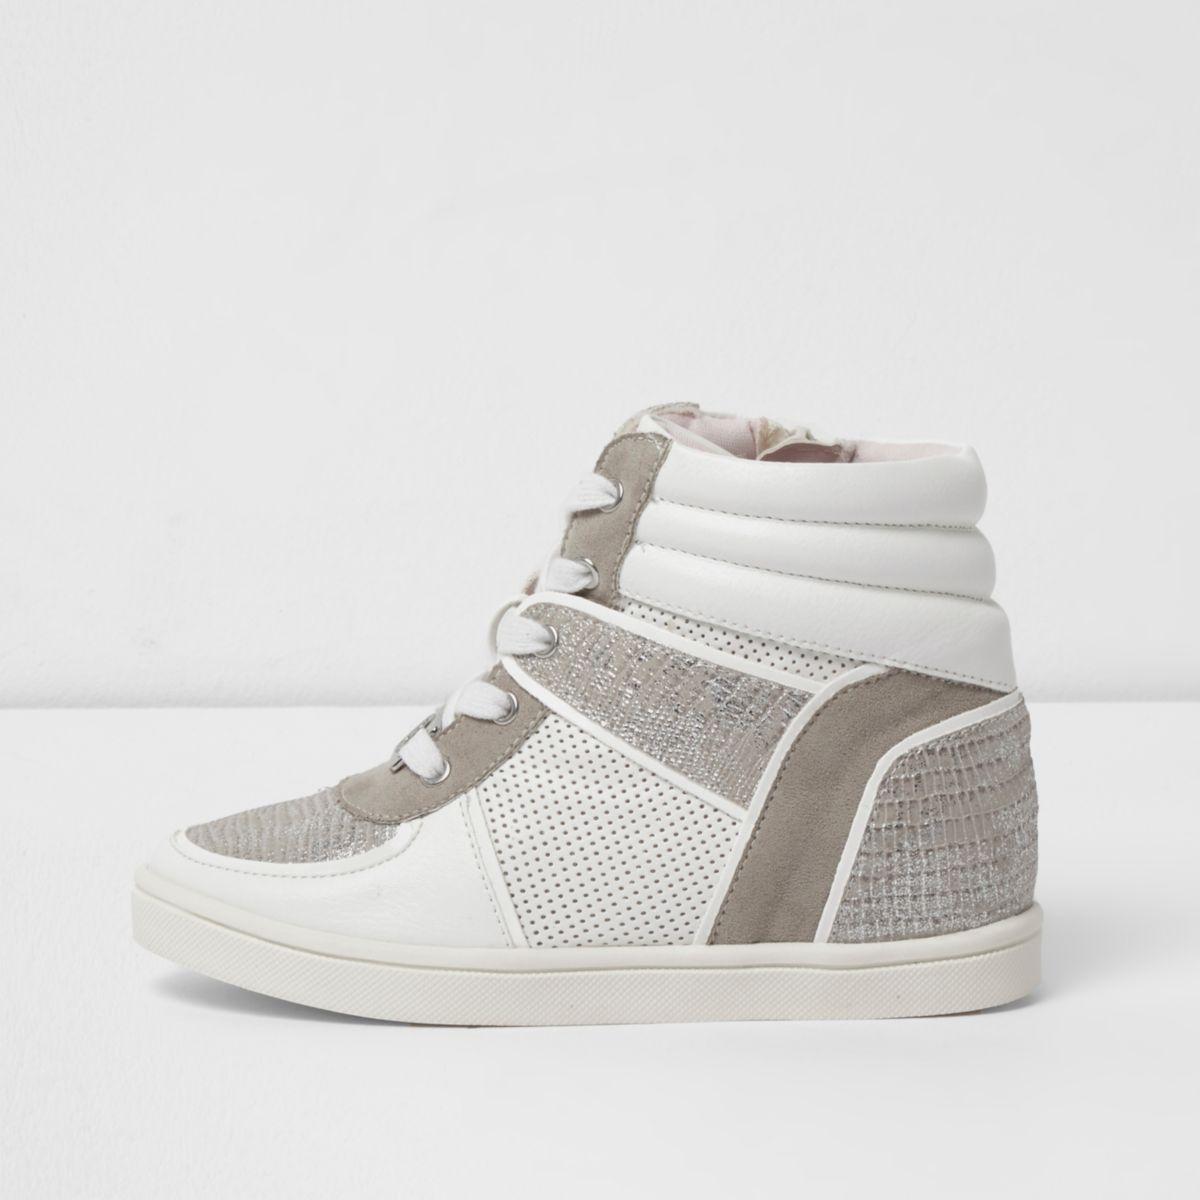 Girls white snakeskin panel high top sneakers